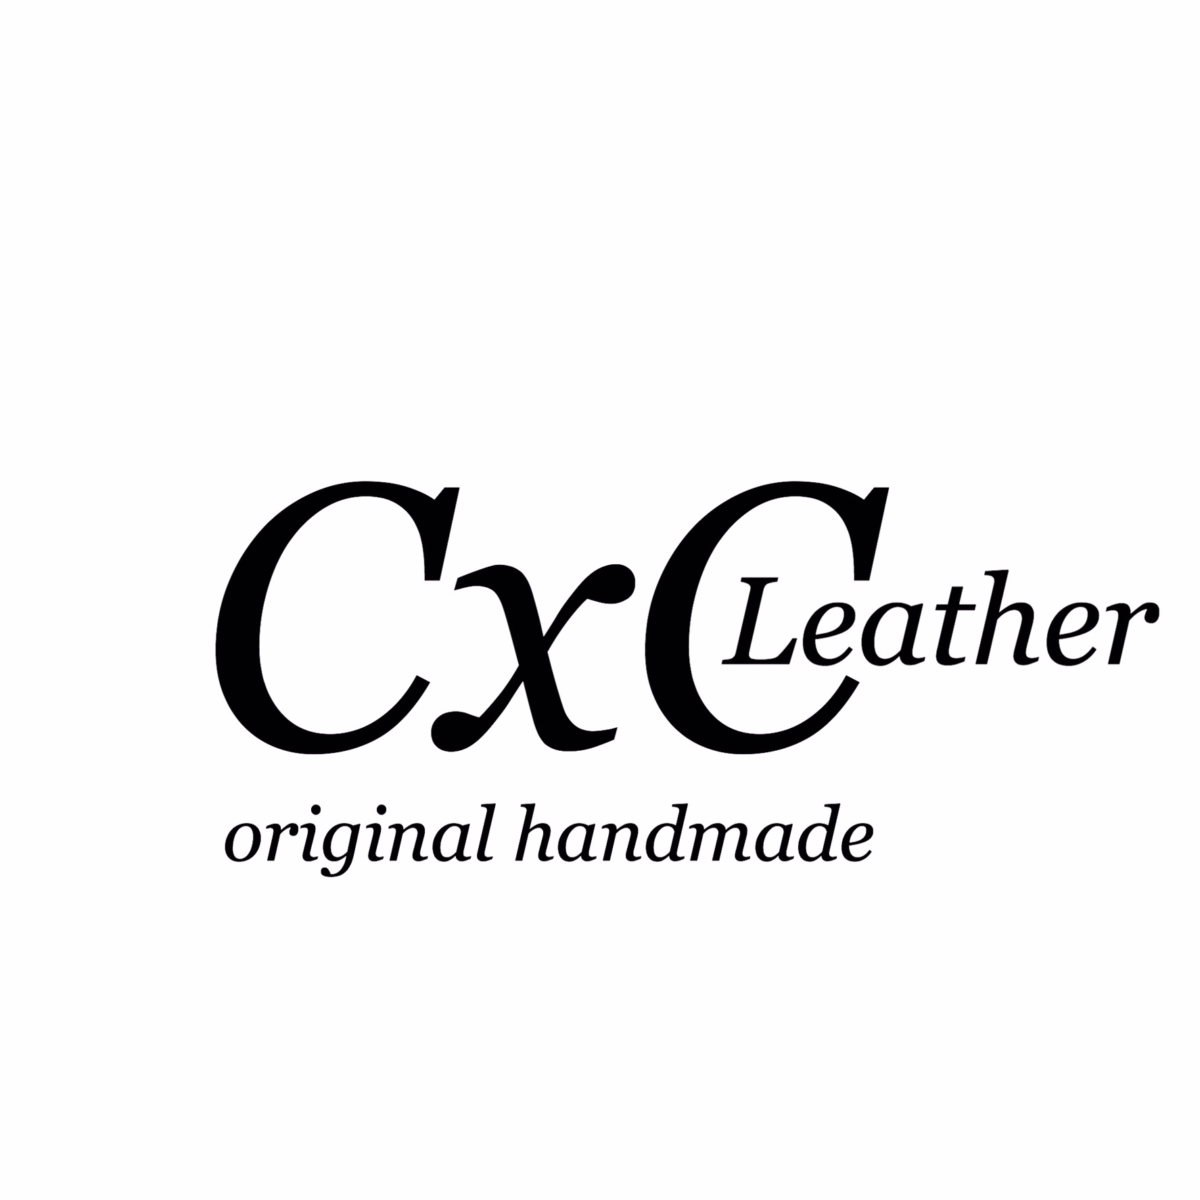 cxcleather CxC Leather シーバイシーレザー ブランドロゴ